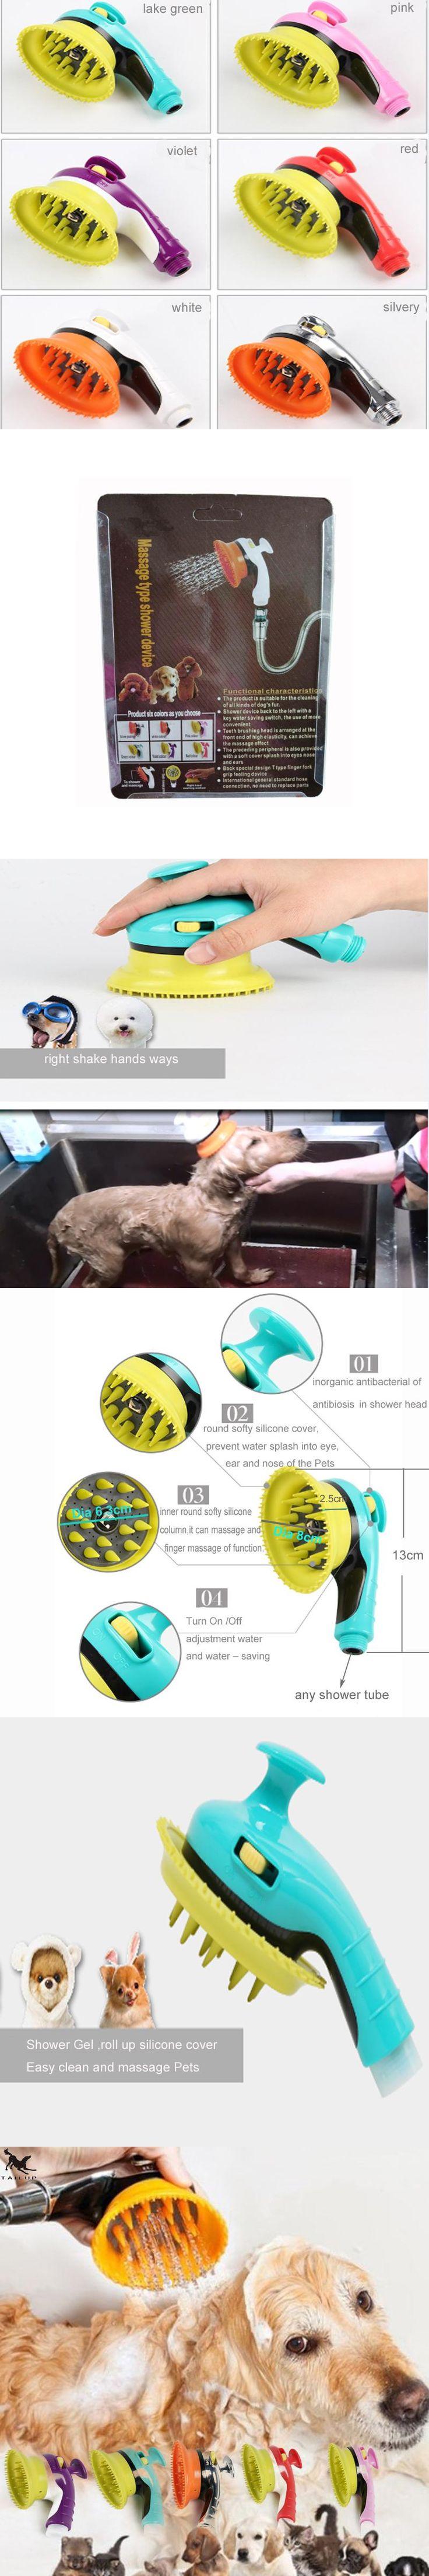 Best 25 Shower head cleaning ideas on Pinterest